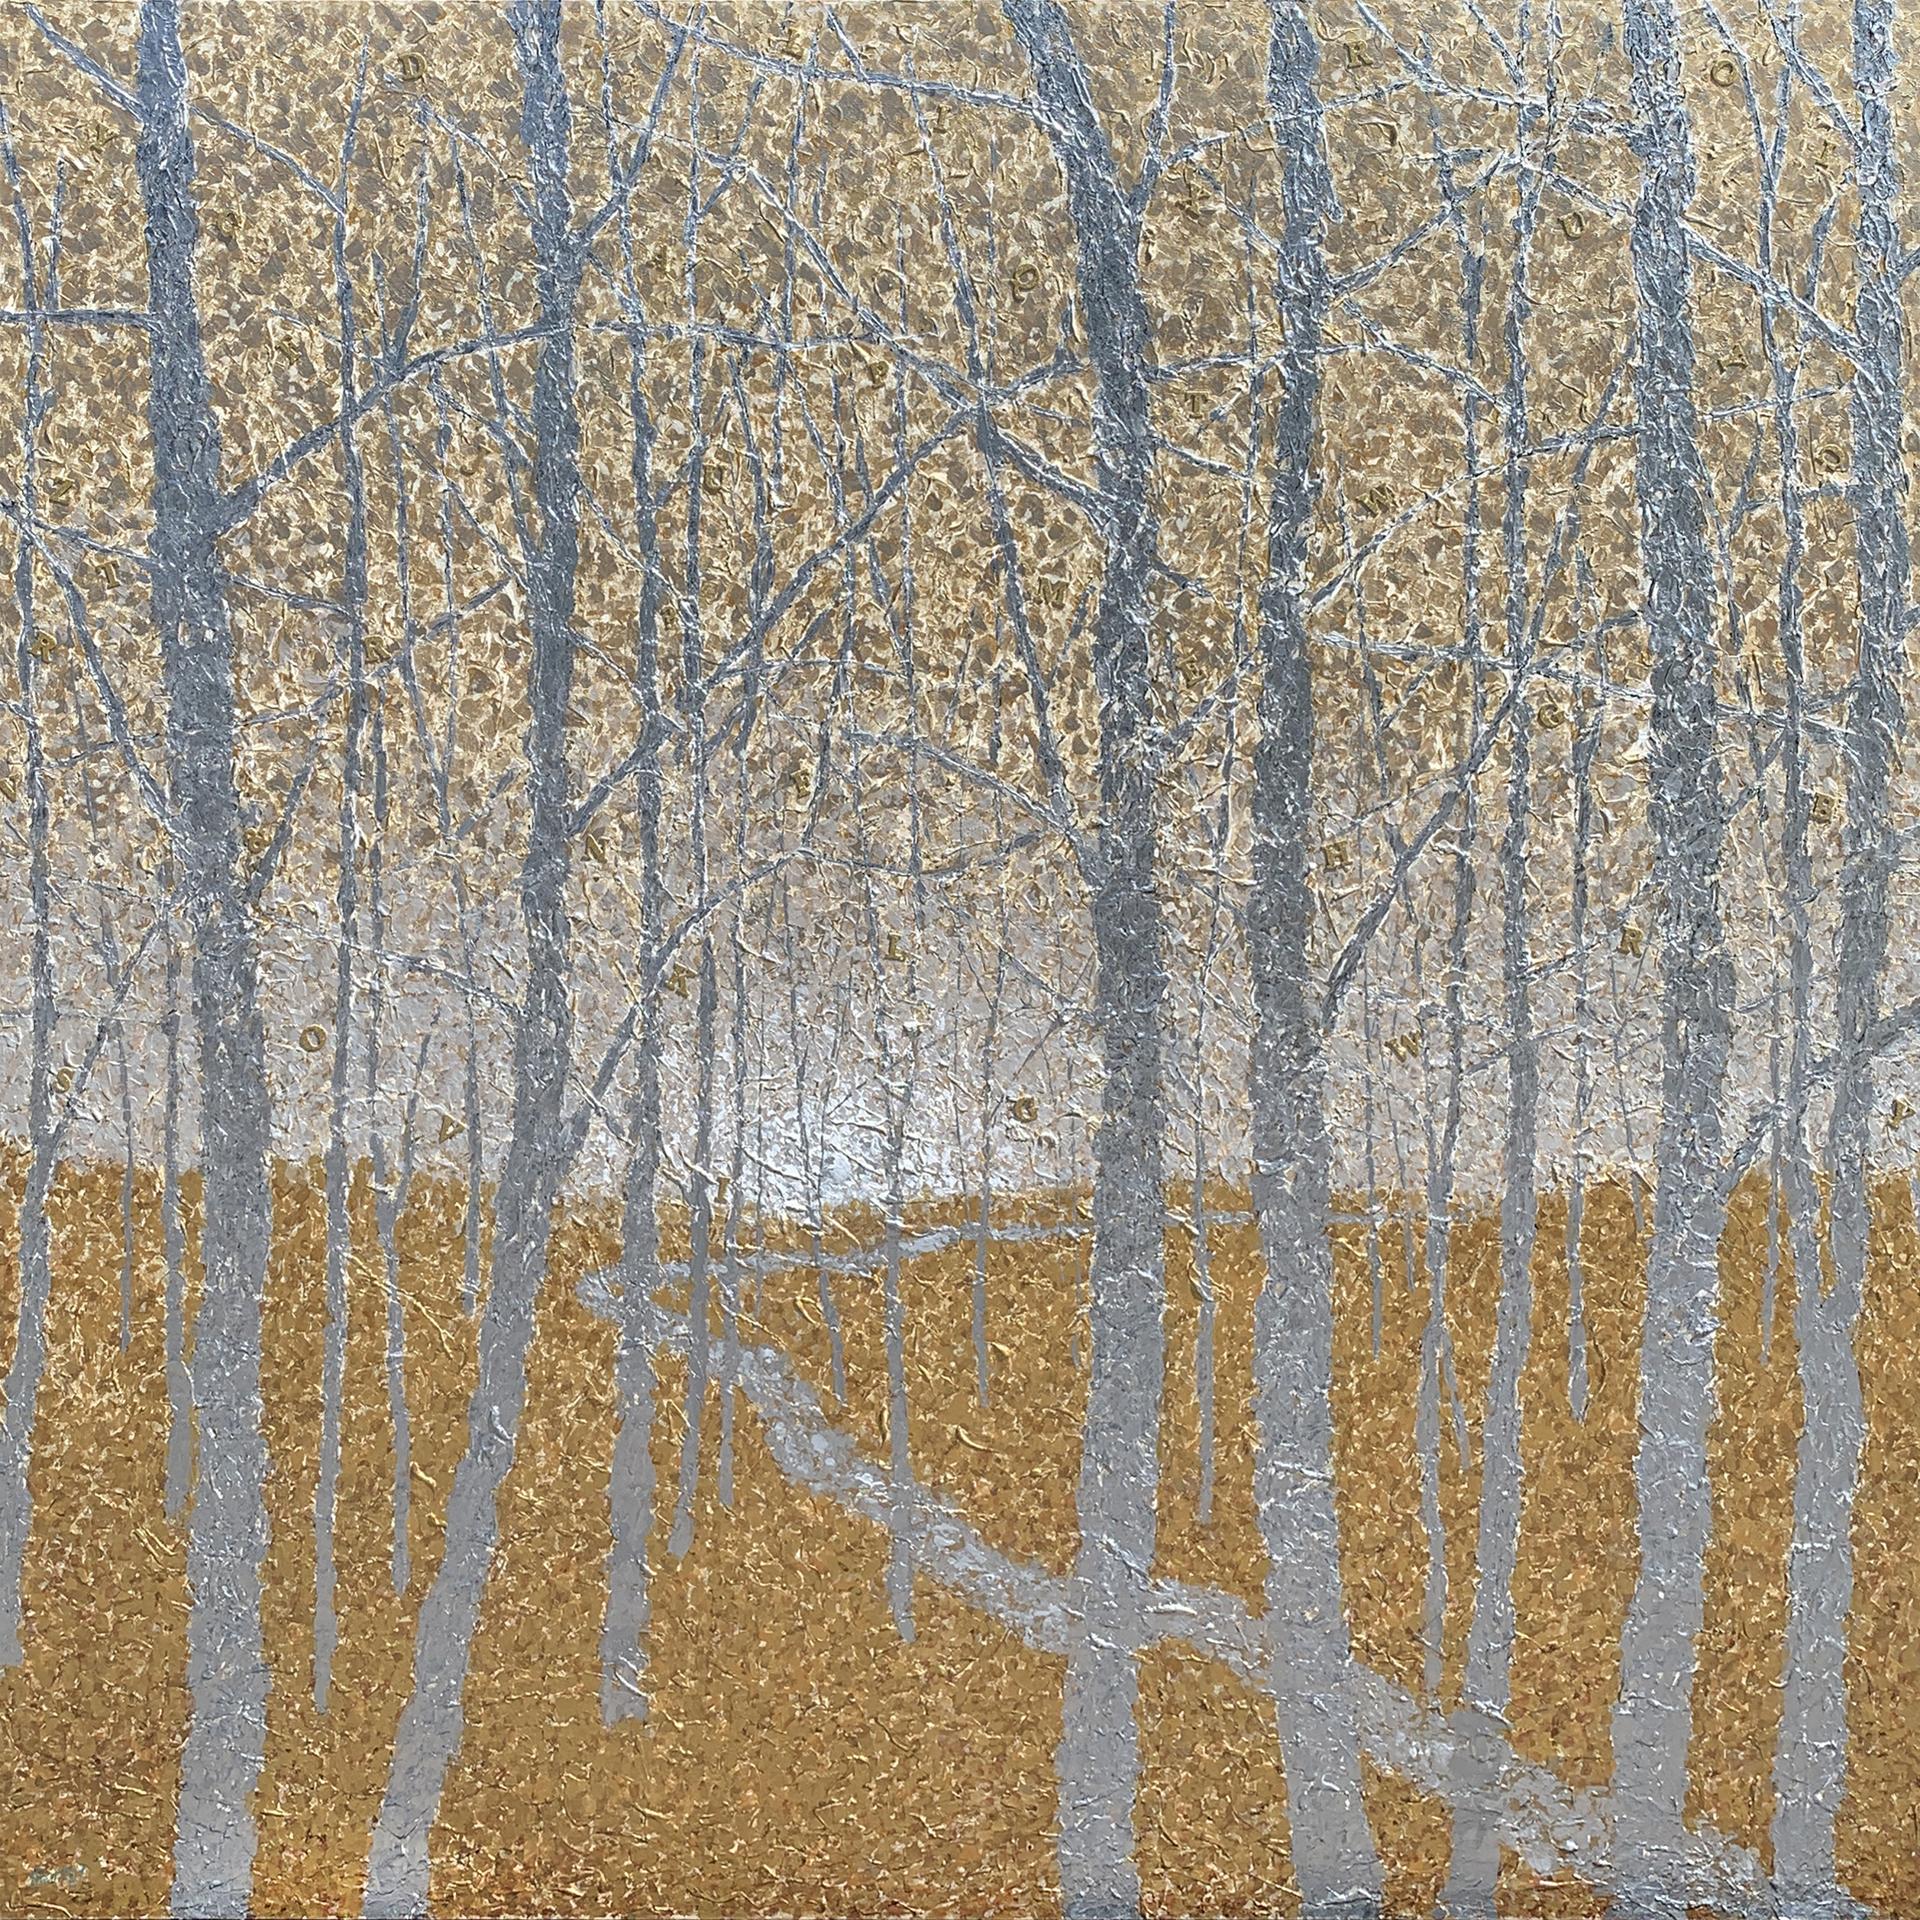 Forest Musings by Barrett Edwards